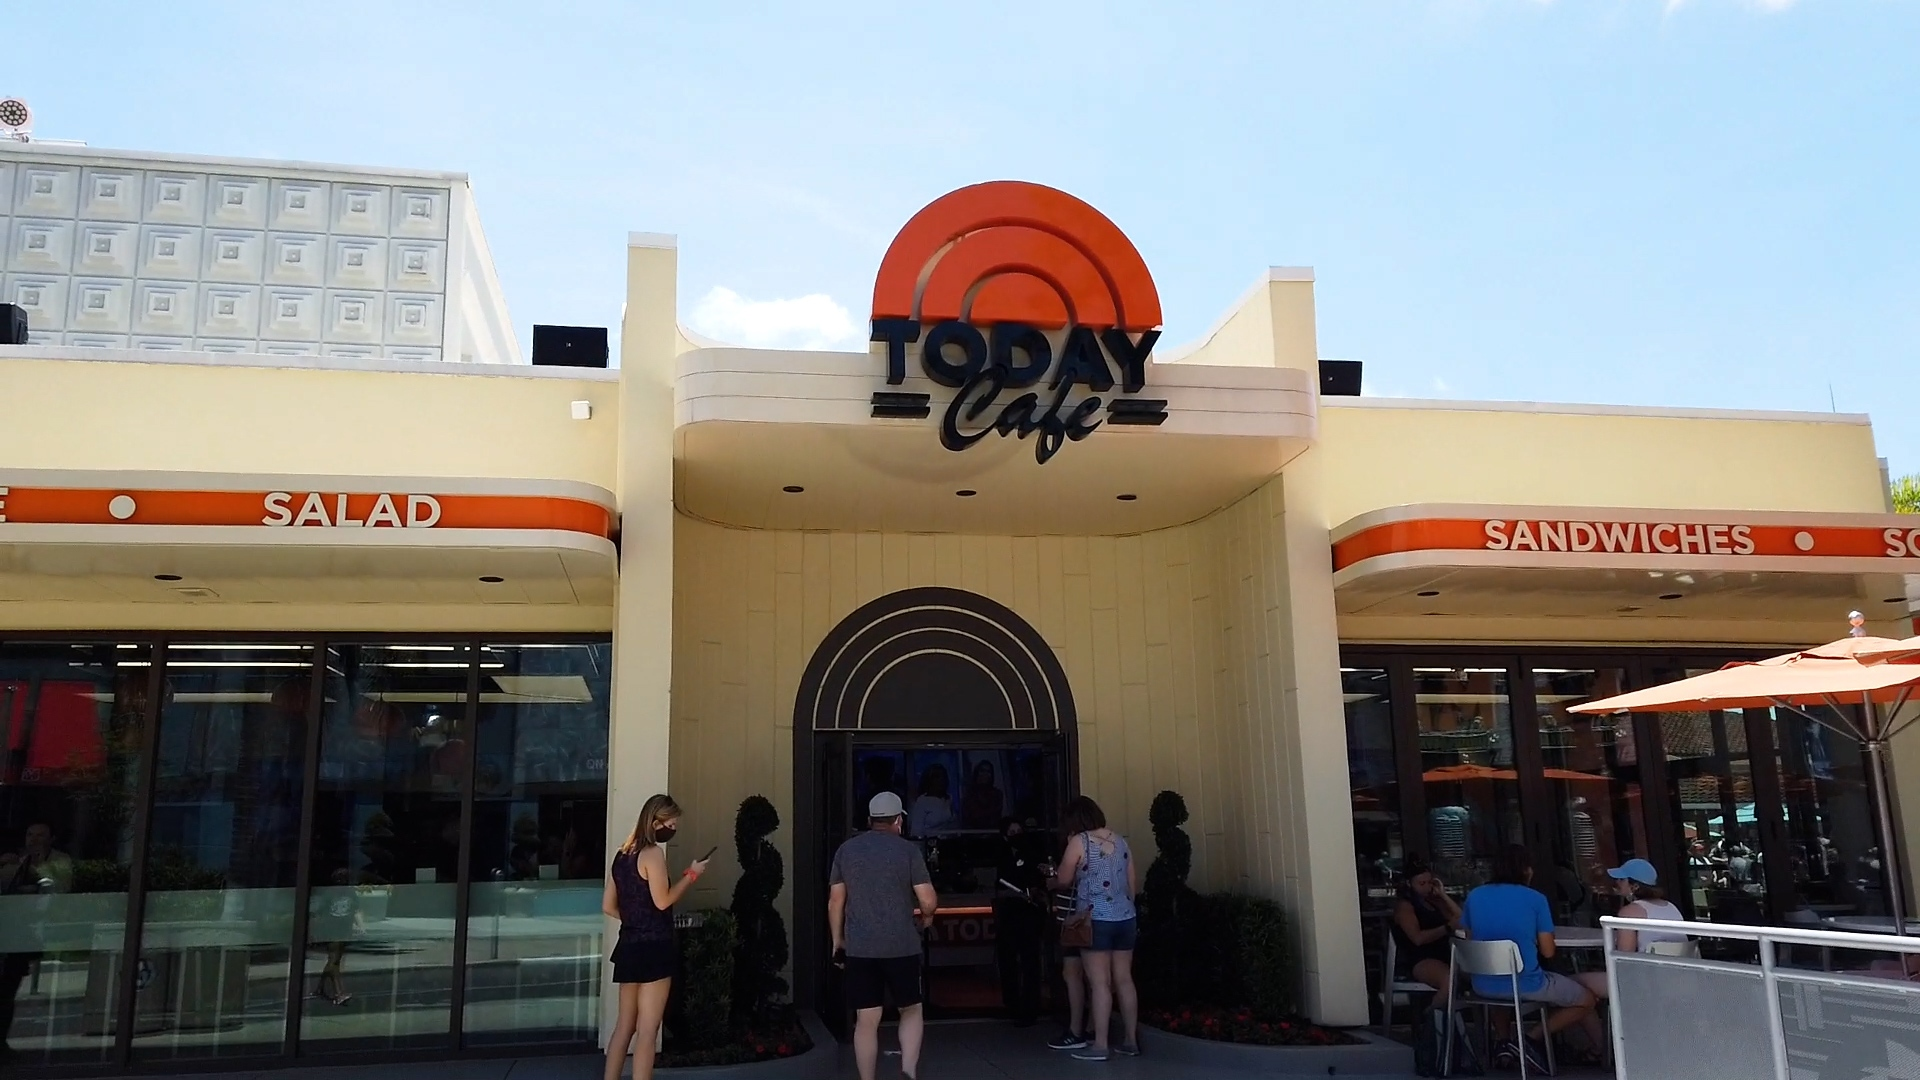 today cafe universal studios